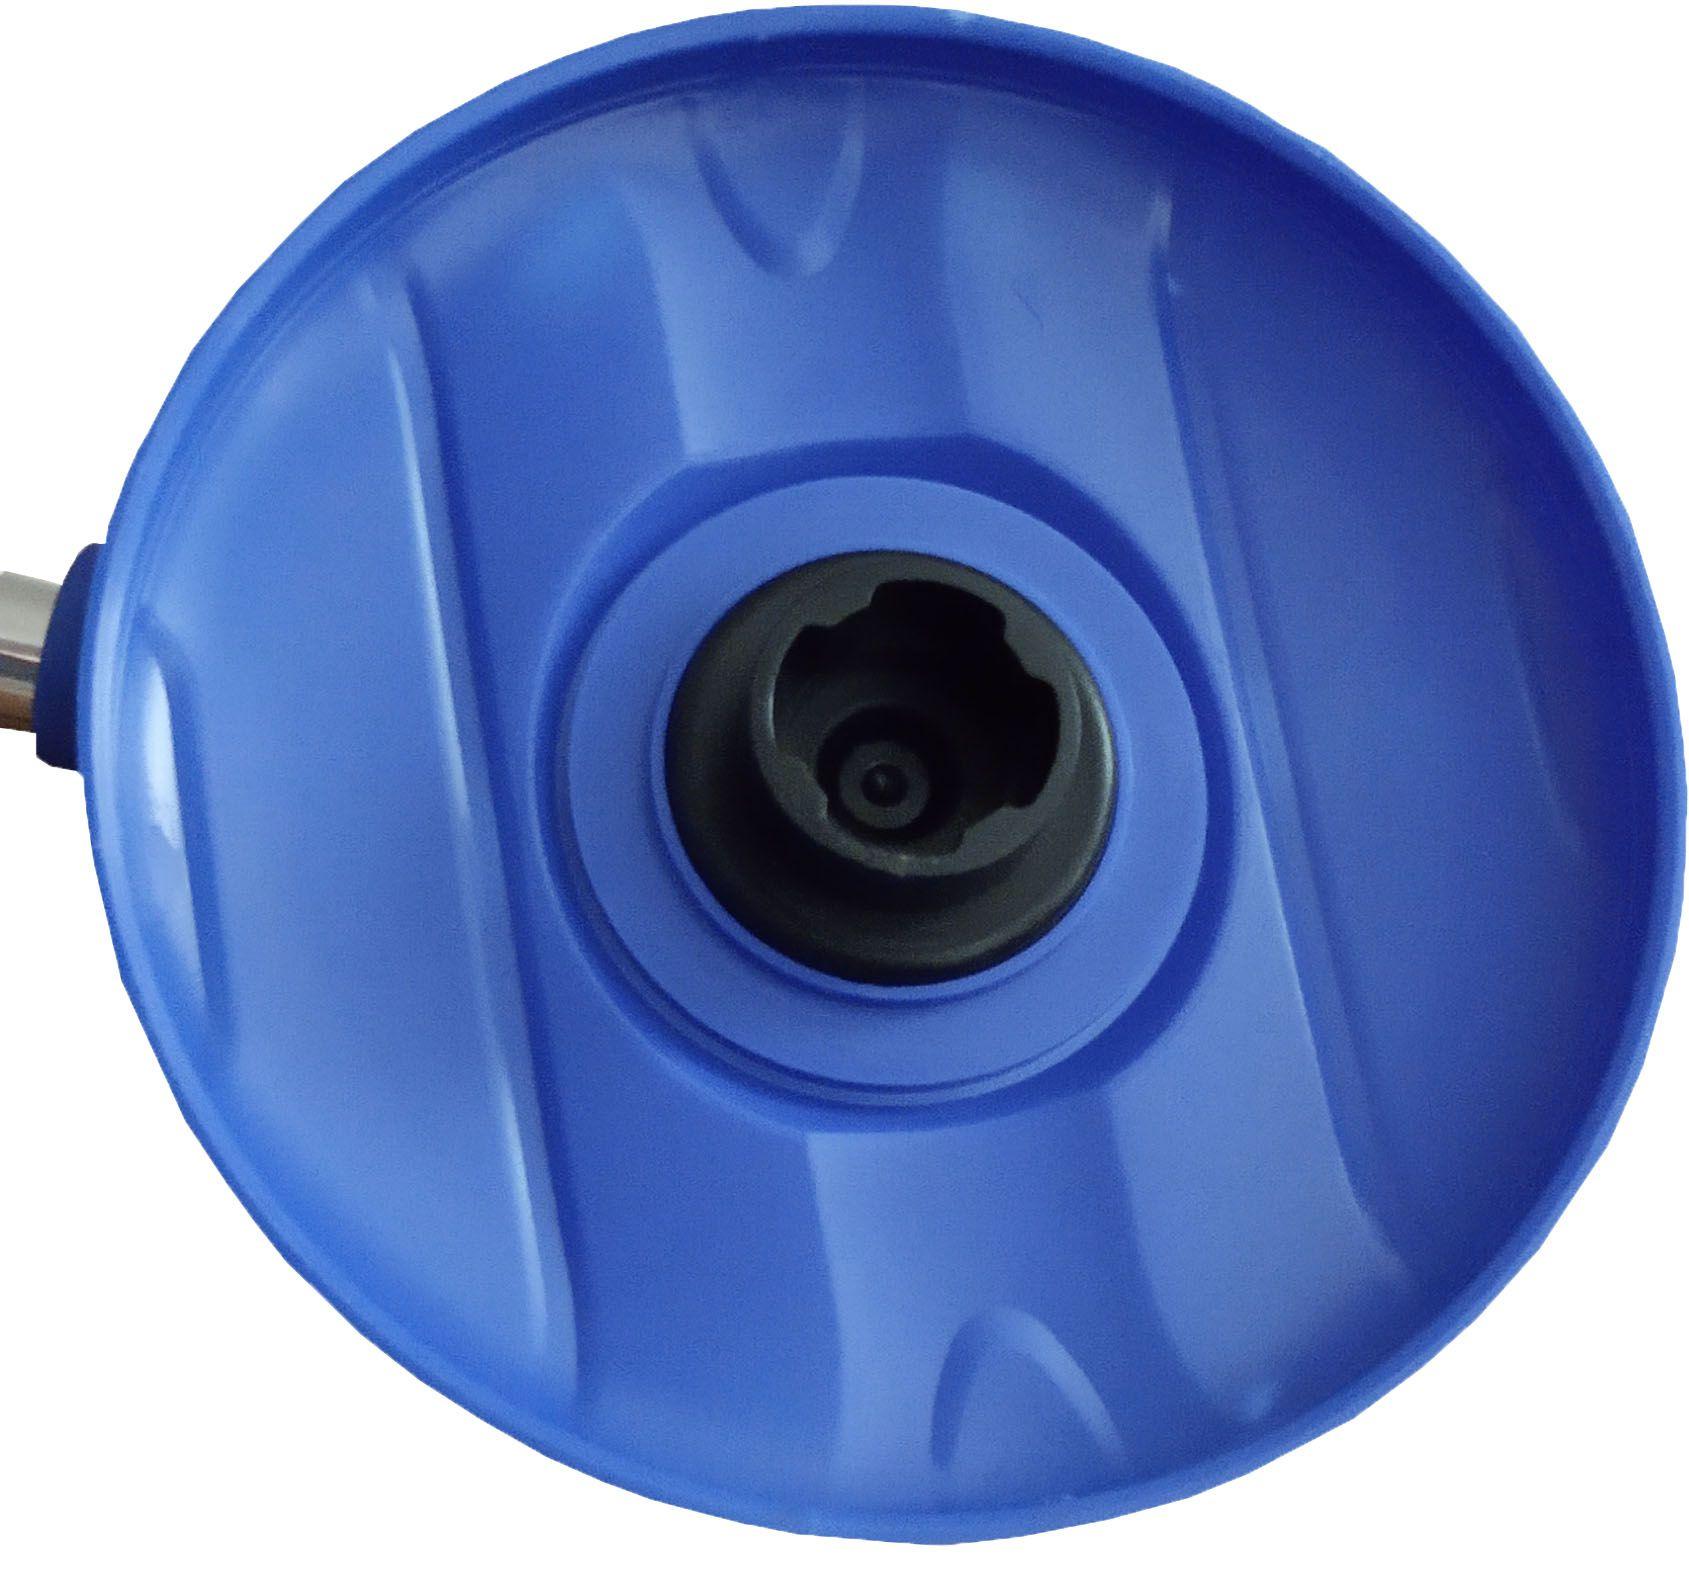 Perfect Mop 360 Cesto Inox  Com 2 Refis Microfibra e Cabo 1,60 Metros